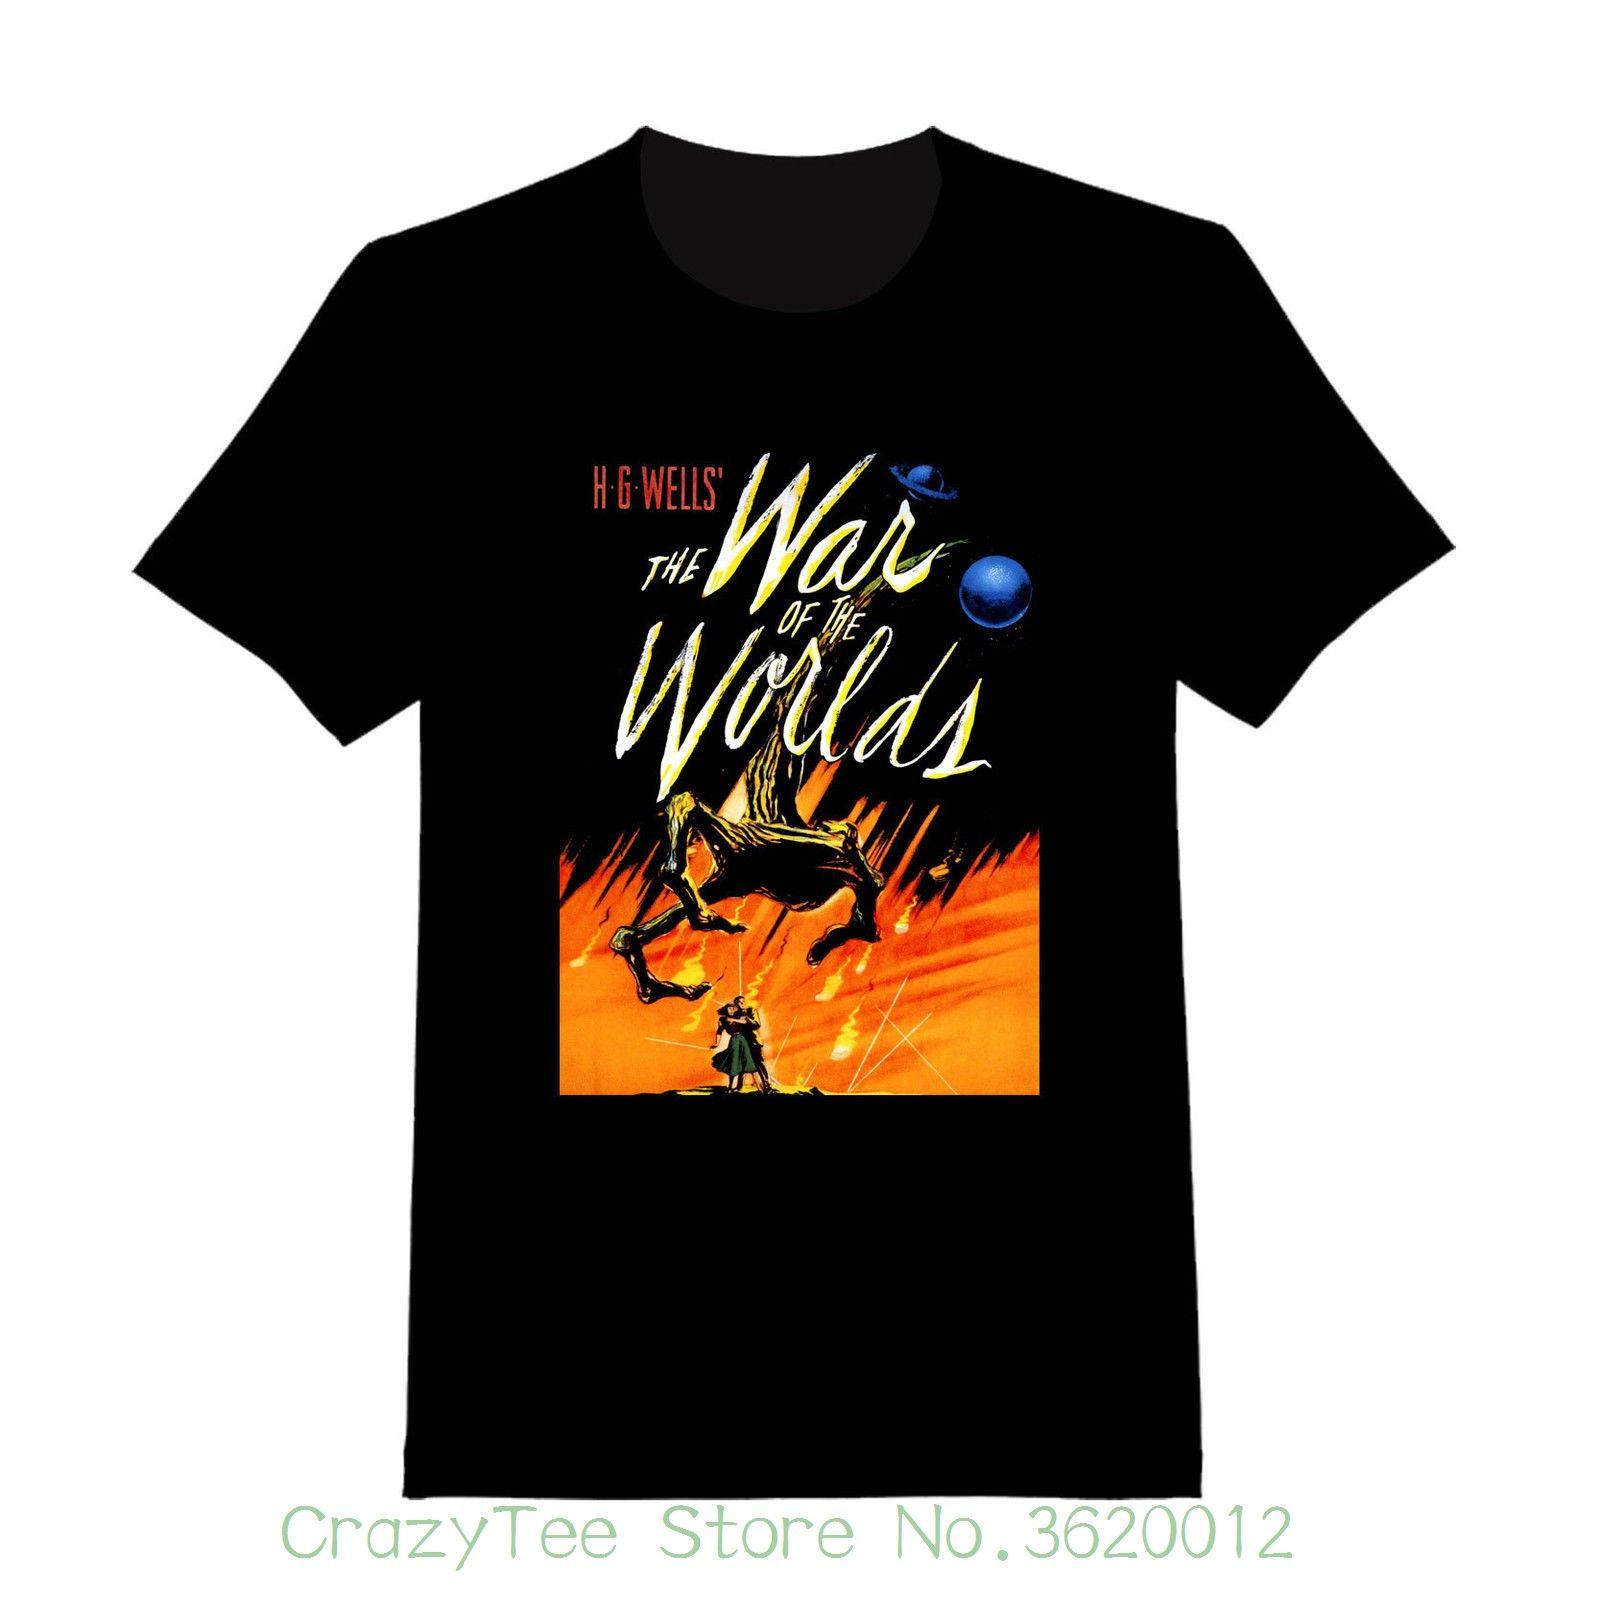 71daacffa Women'S Tee War Of The Worlds Custom T Shirt 150 Cotton Casual Lady Women  Tops Tees T Shirt Buy Cool T Shirt Companies From Crazyteestore, $23.95|  DHgate.